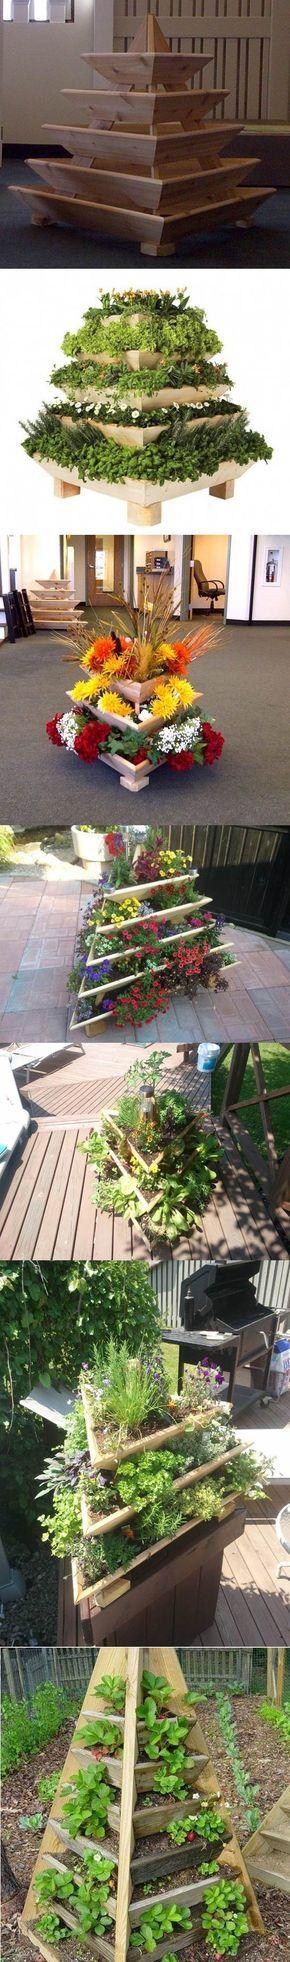 Creative Idea of Home Gardening - Triolife Plant Pyramid | iCreativeIdeas.com Like Us on Facebook ==> https://www.facebook.com/icreativeideas